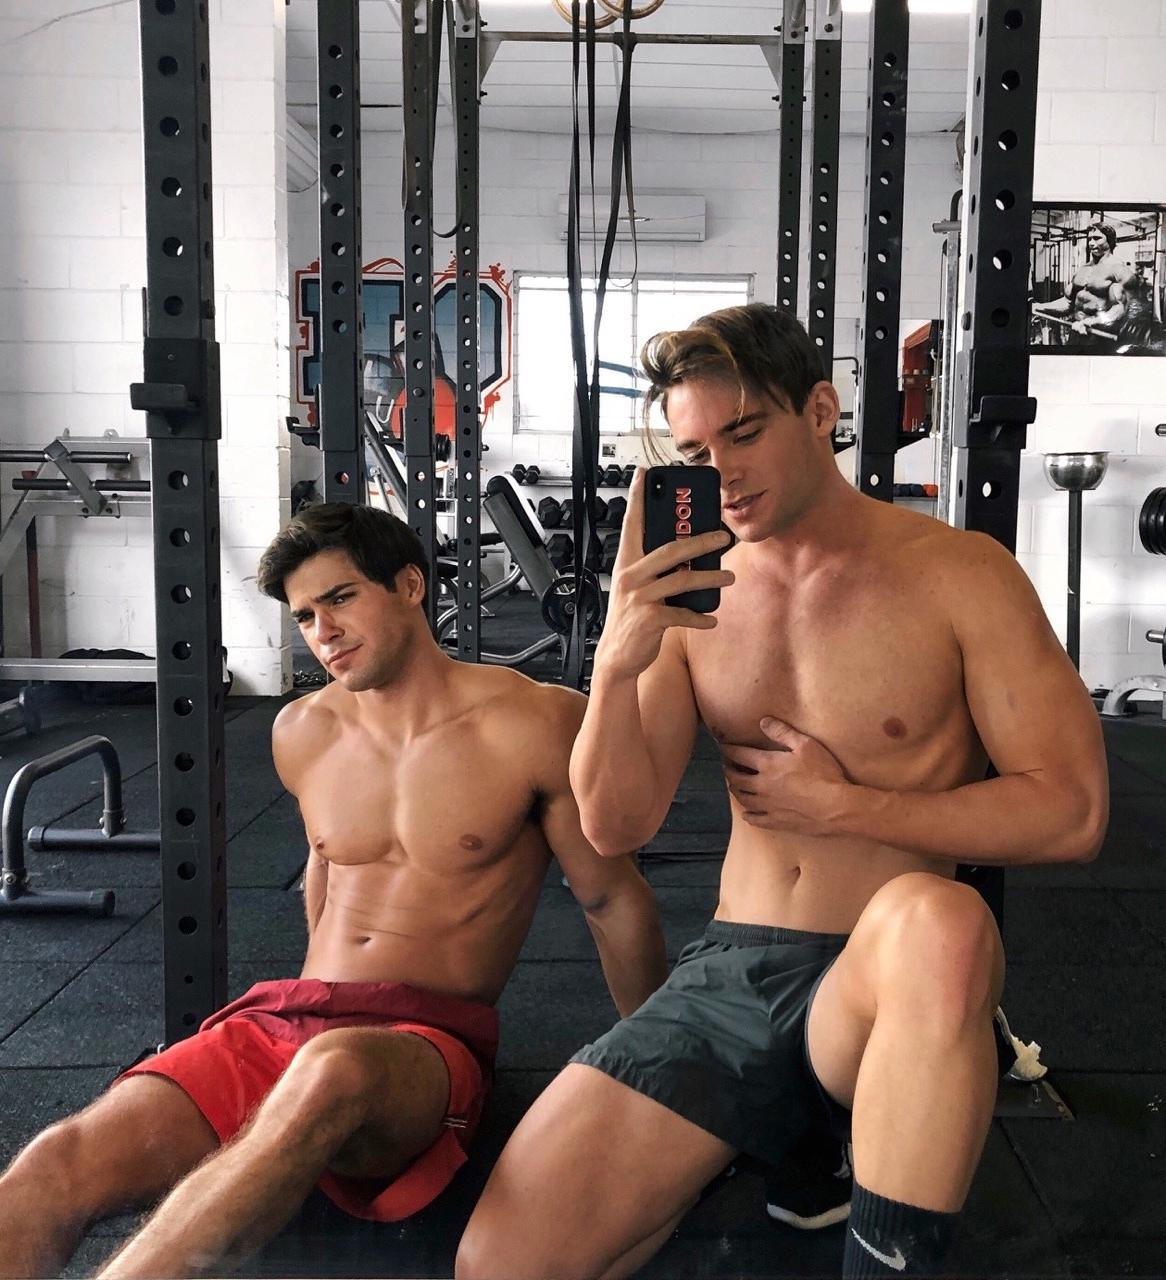 two-fit-shirtless-hot-gym-buddies-selfie